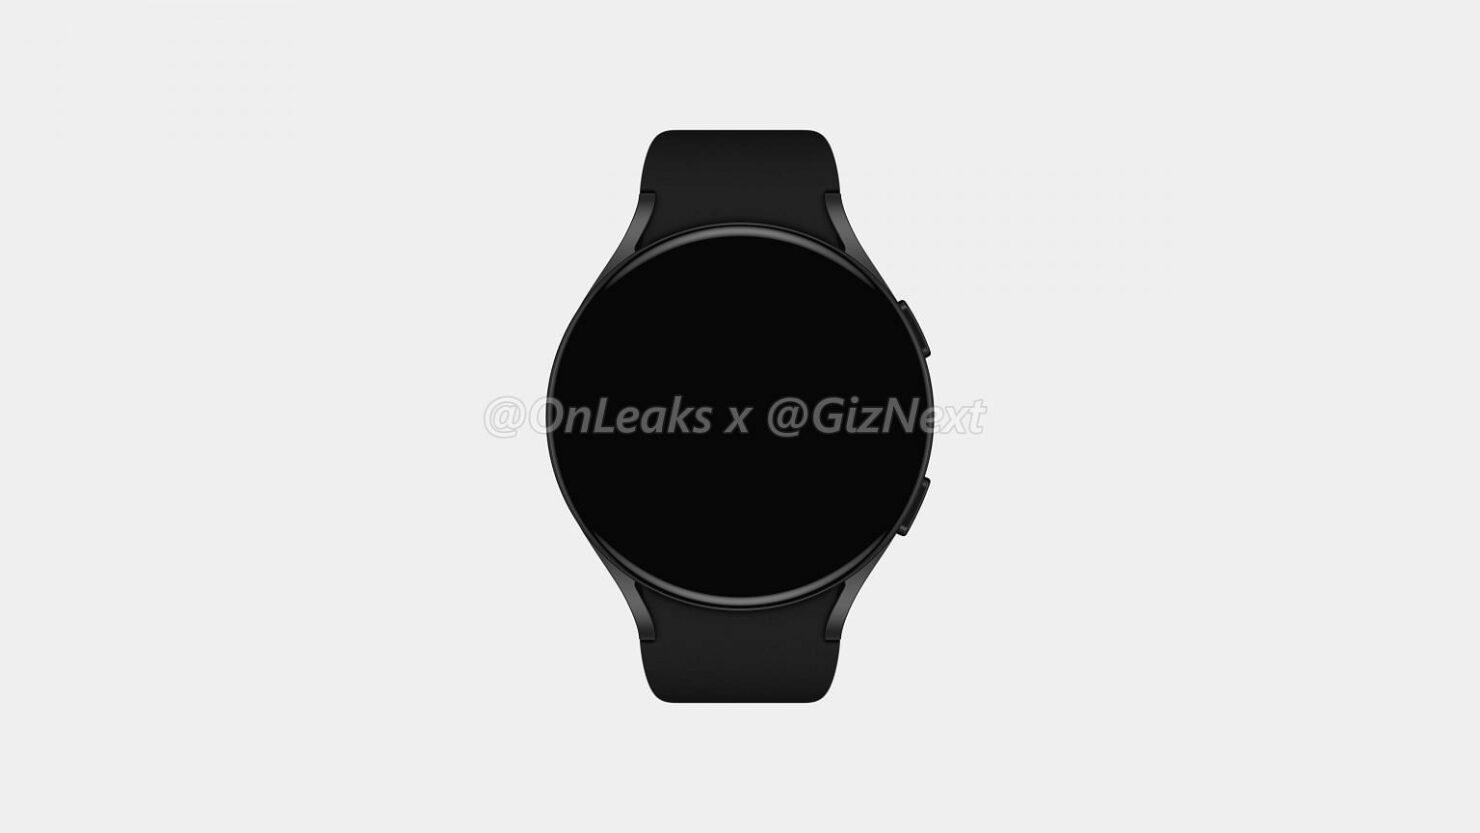 galaxy-watch-active-4-1-1536x864